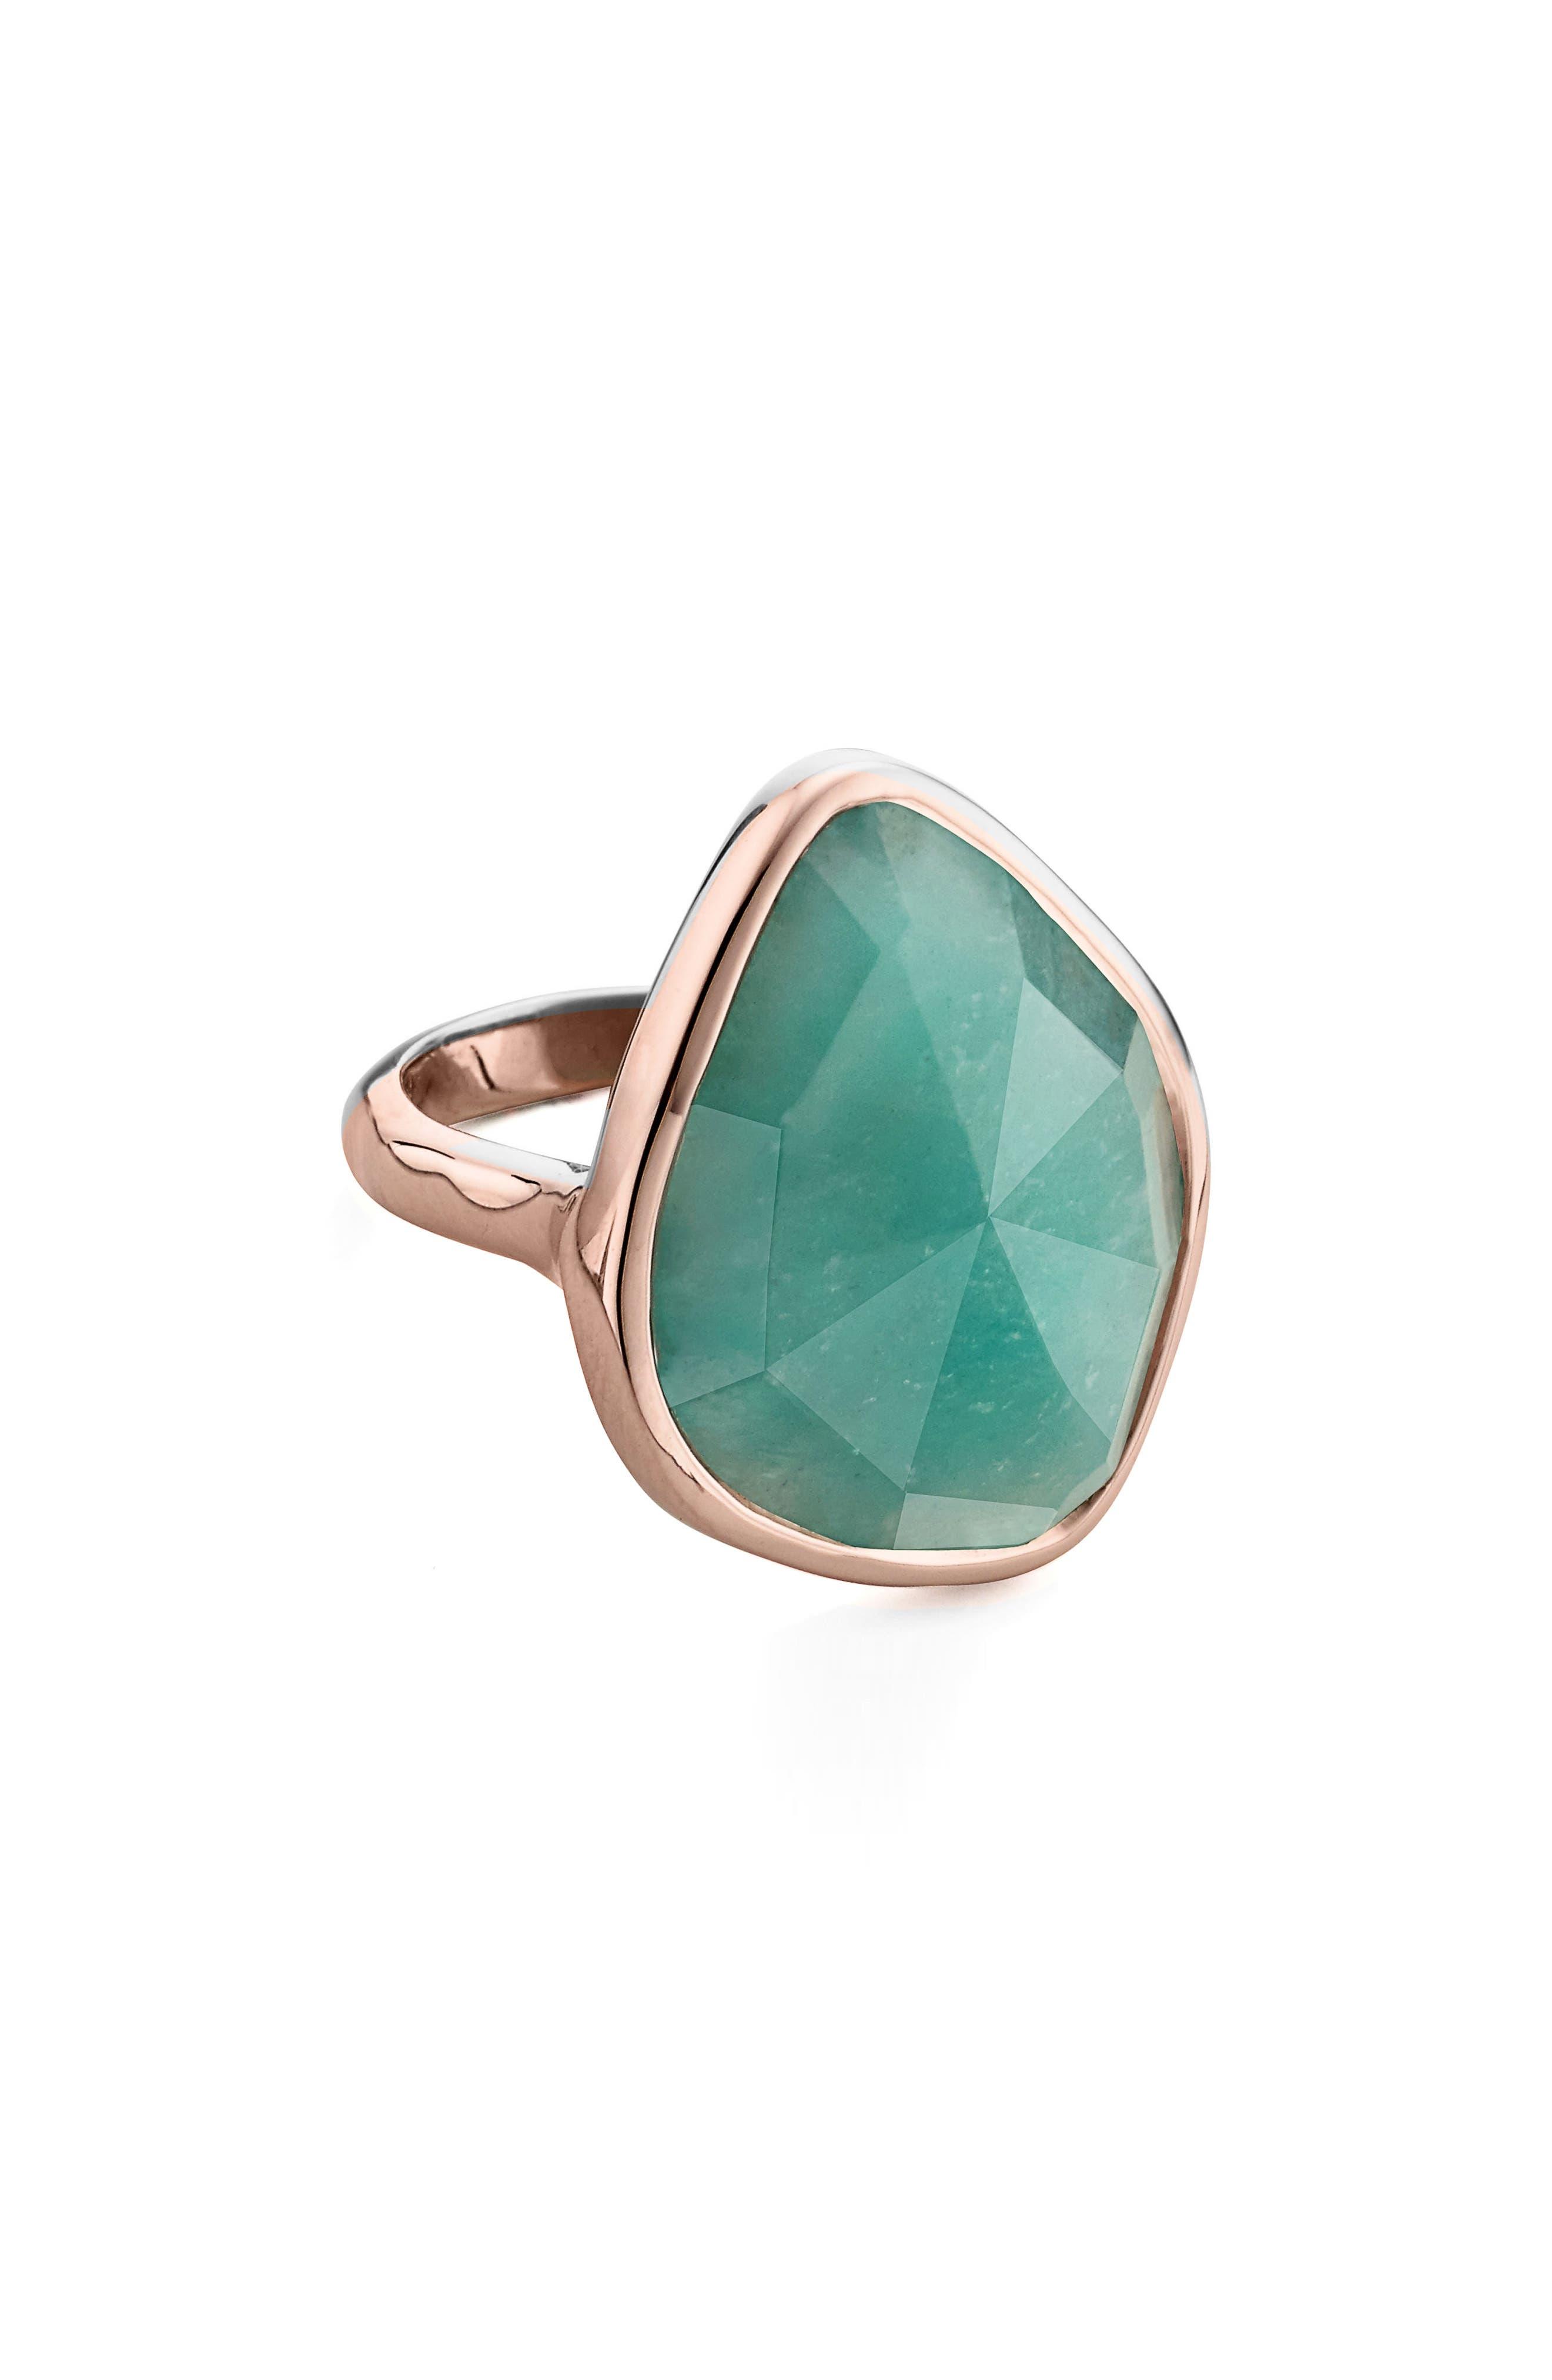 MONICA VINADER Siren Nugget Semiprecious Stone Cocktail Ring, Main, color, ROSE GOLD/ AMAZONITE